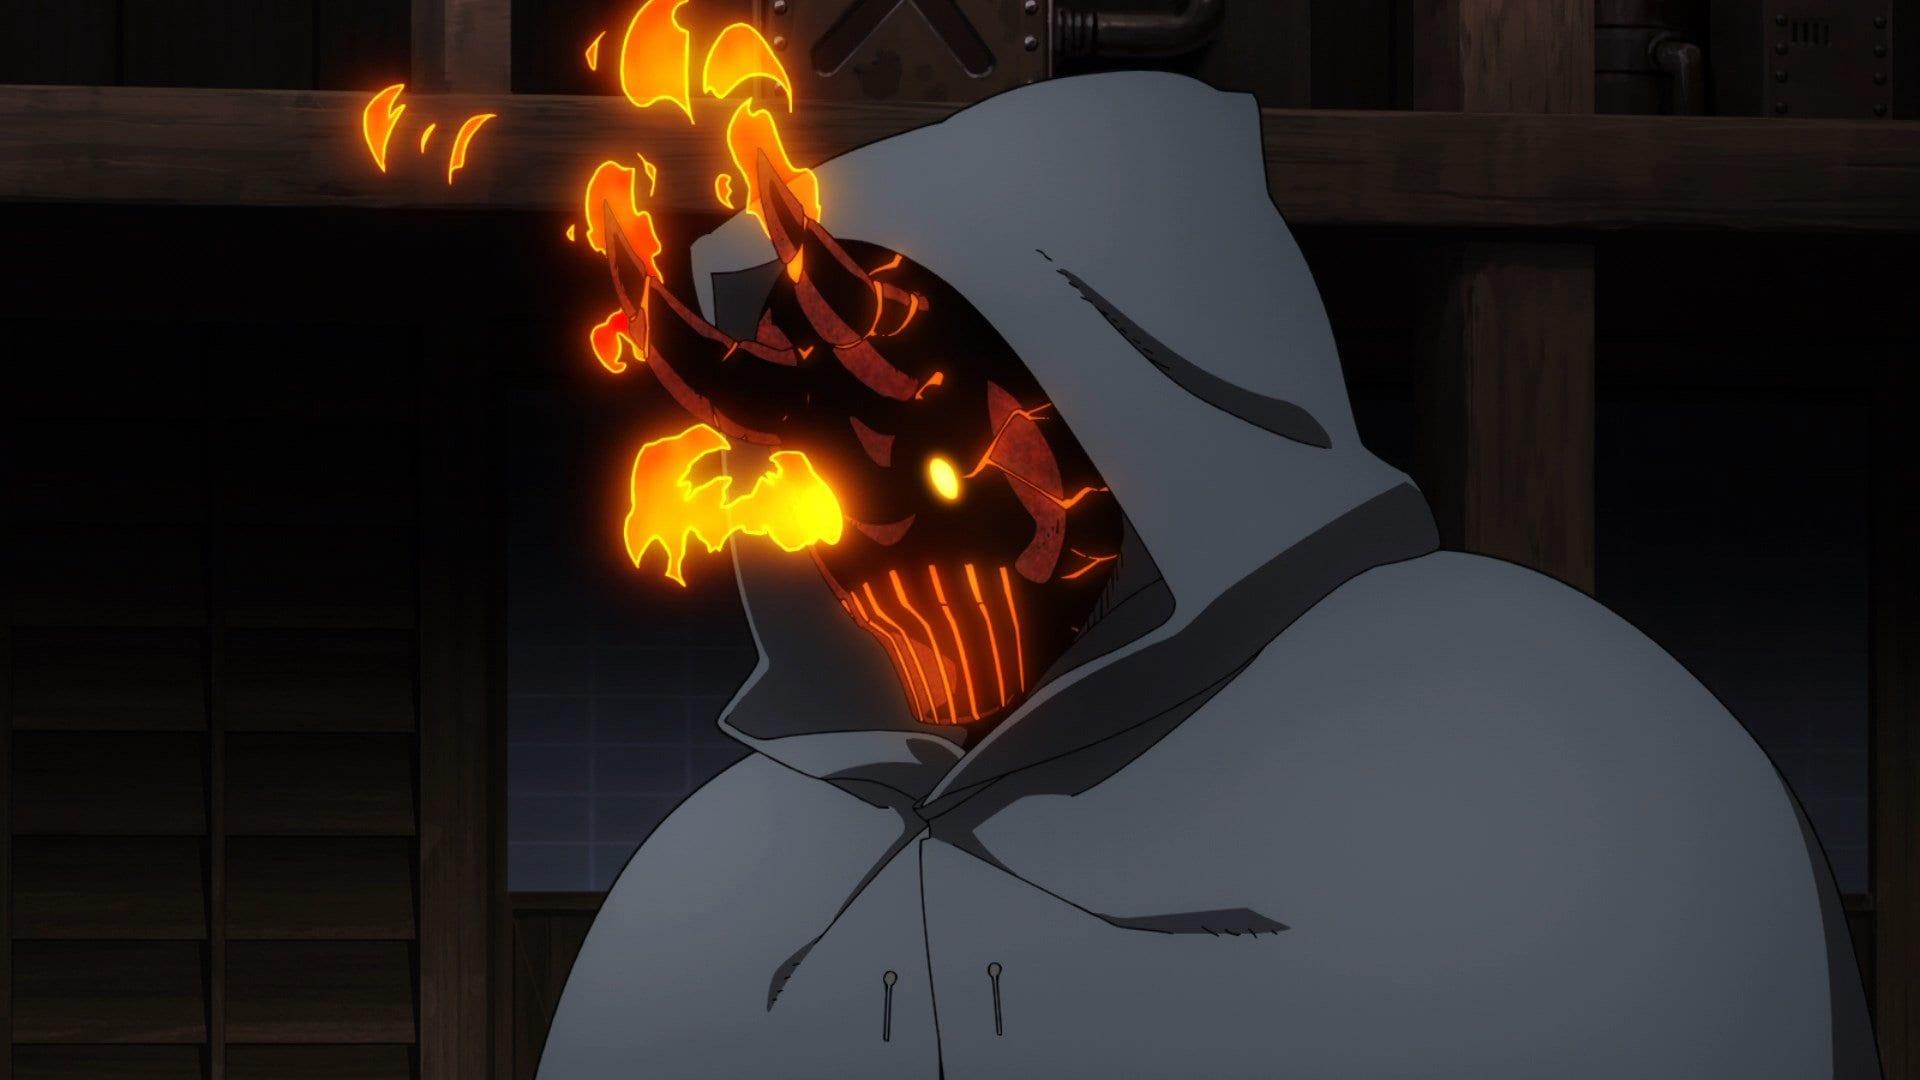 Fire Force Episode 16 update